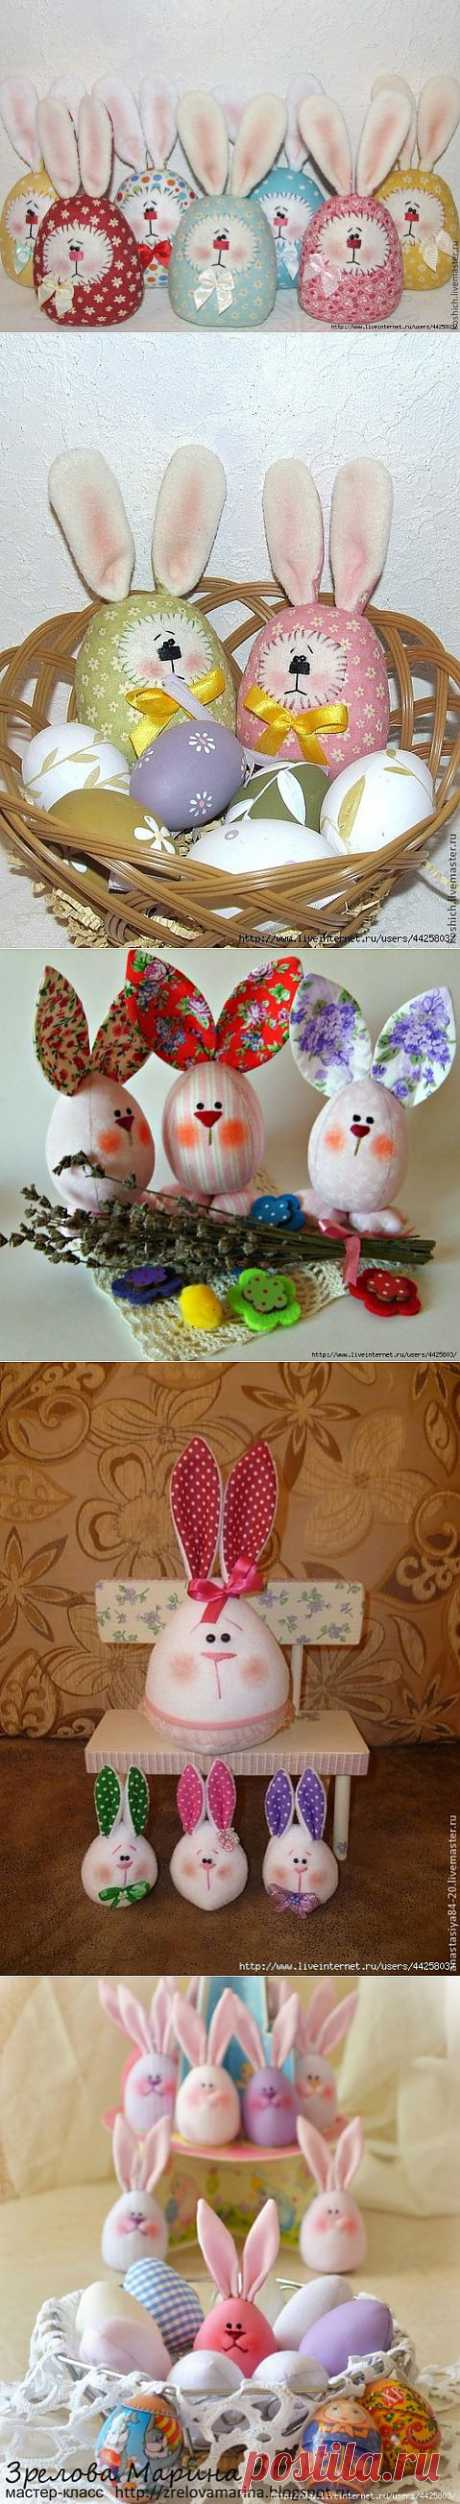 Шьем пасхальных яйца-зайцев. Мастер-класс. | Подружки